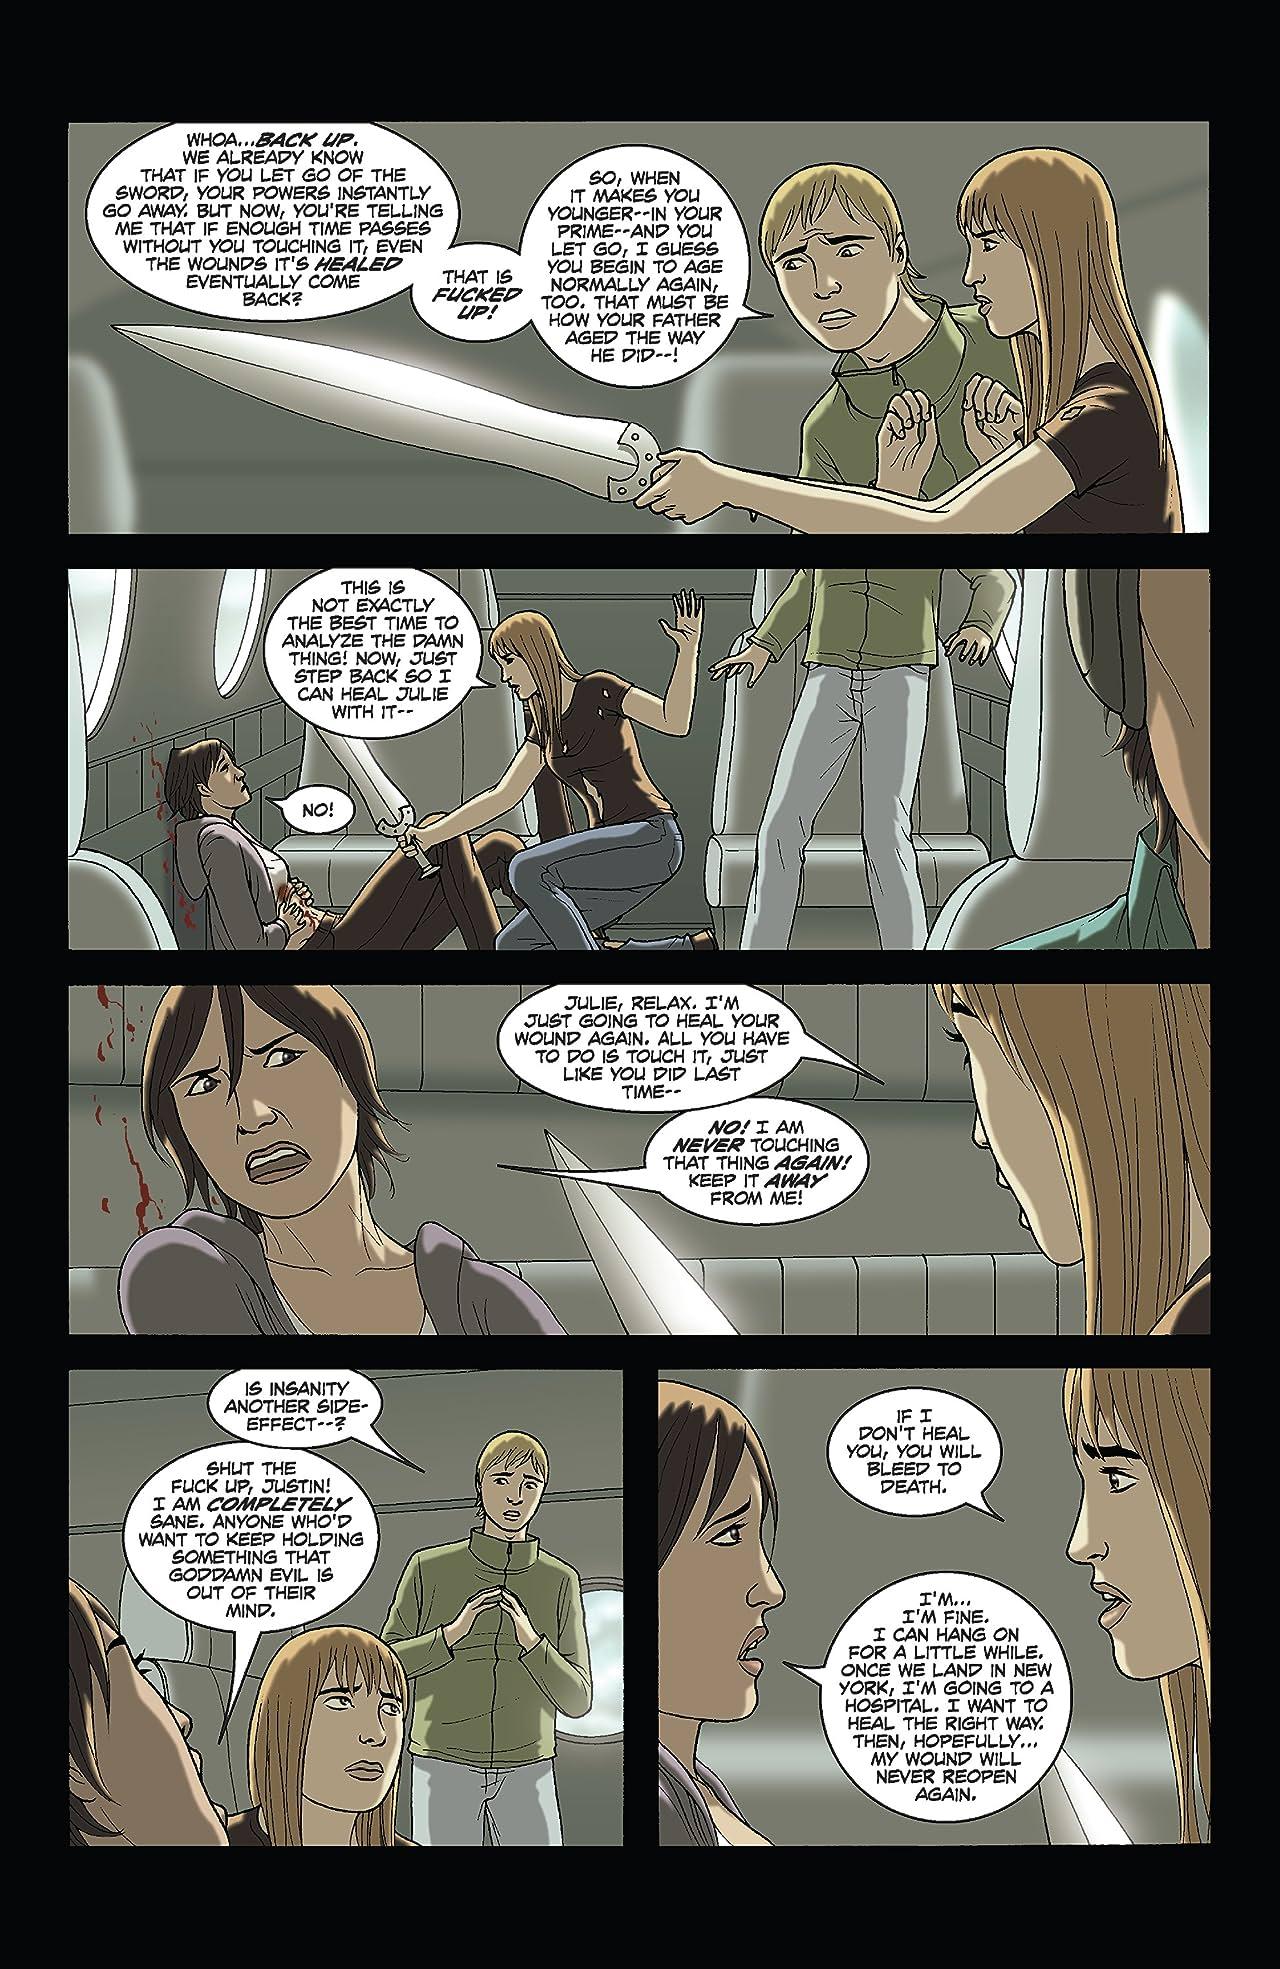 The Sword #20